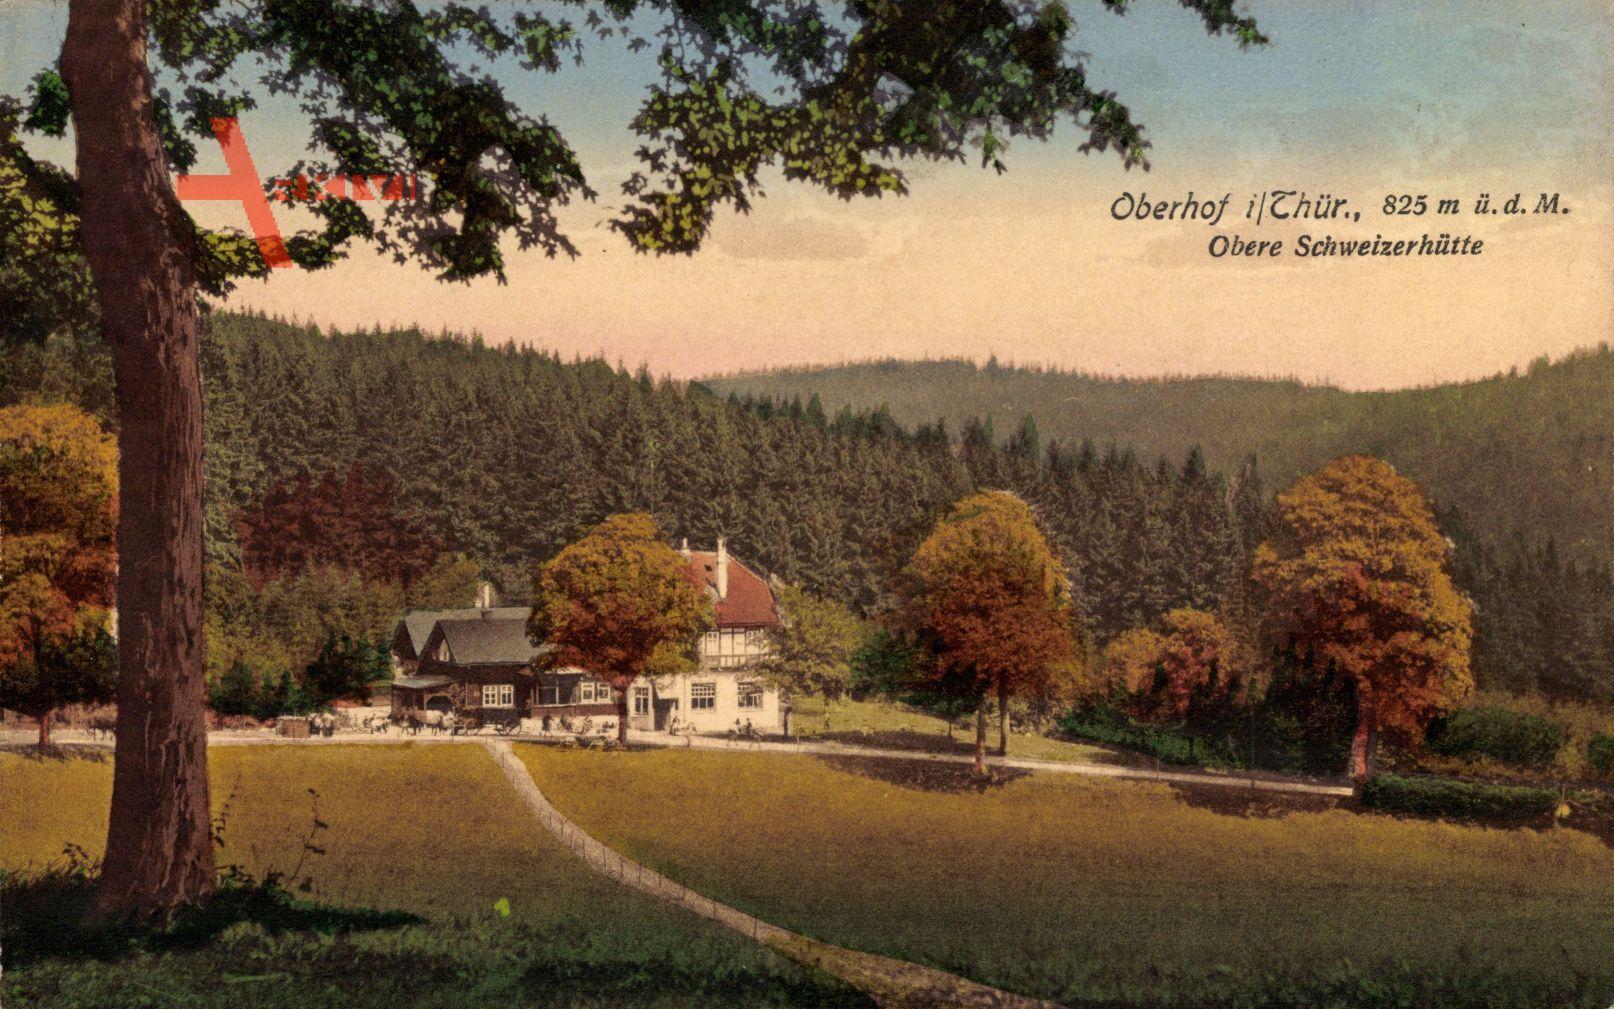 Oberhof im Thüringer Wald, Obere Schweizerhütte, Herbst